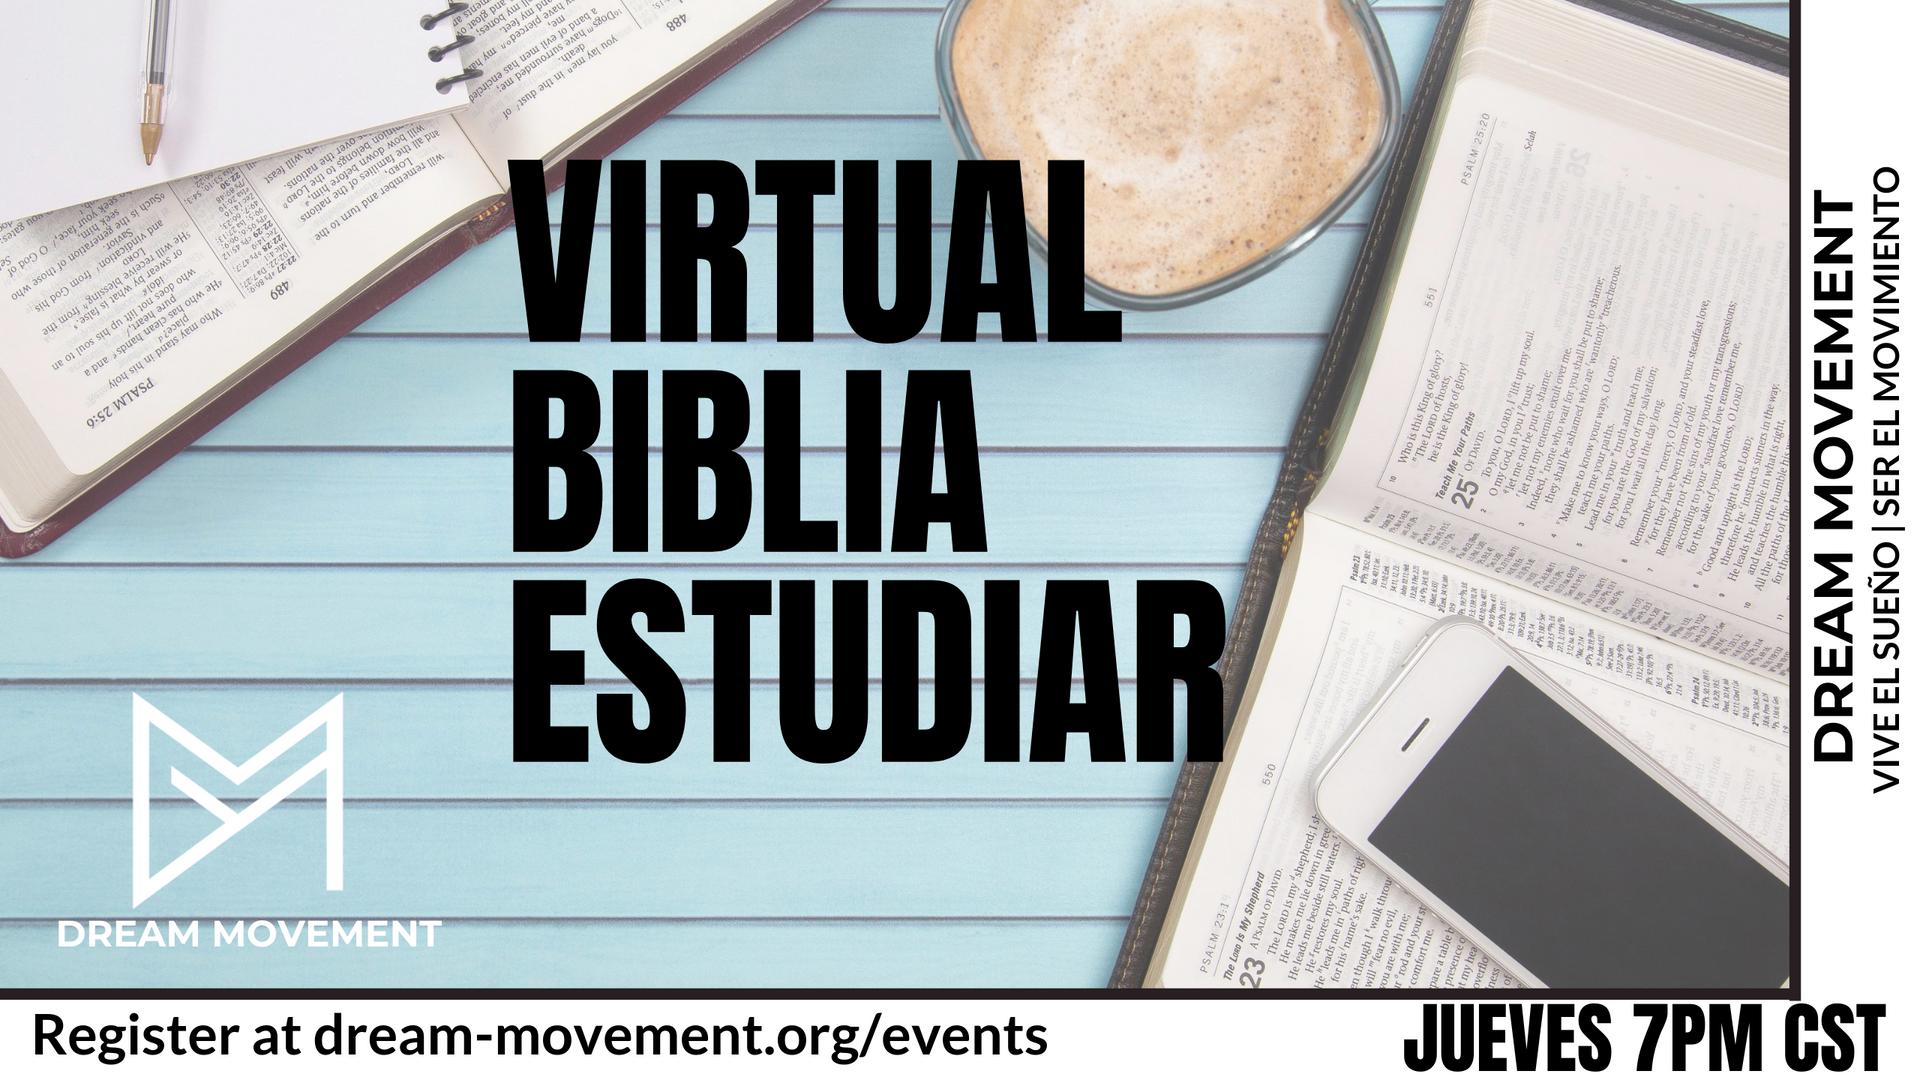 Virtual Biblia Estudiar